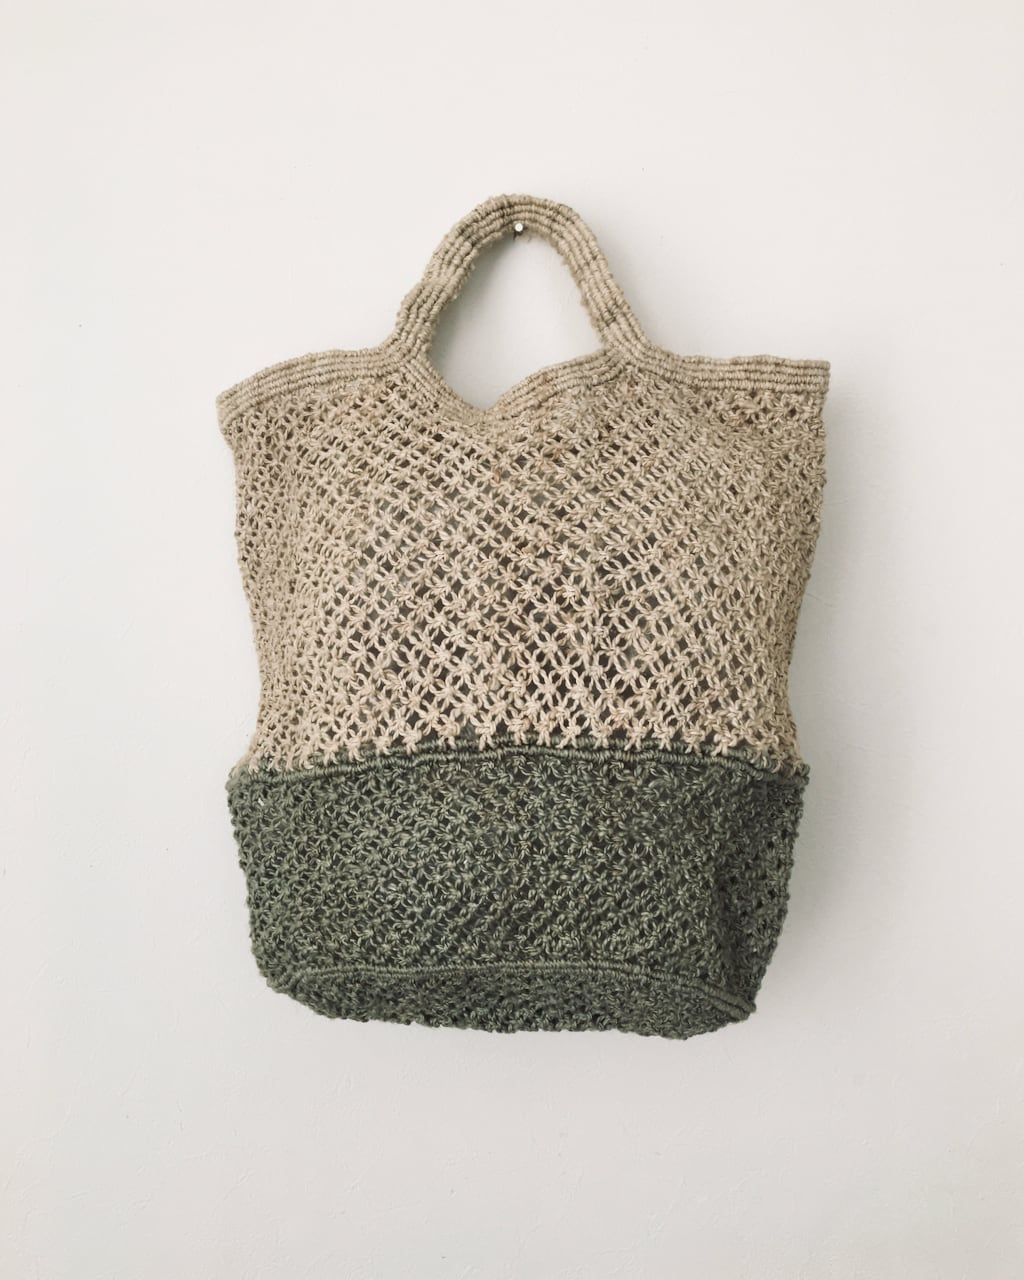 Jute macrame shopping bag Nat/Grey ショッピングバッグ ナチュラル/グレイ